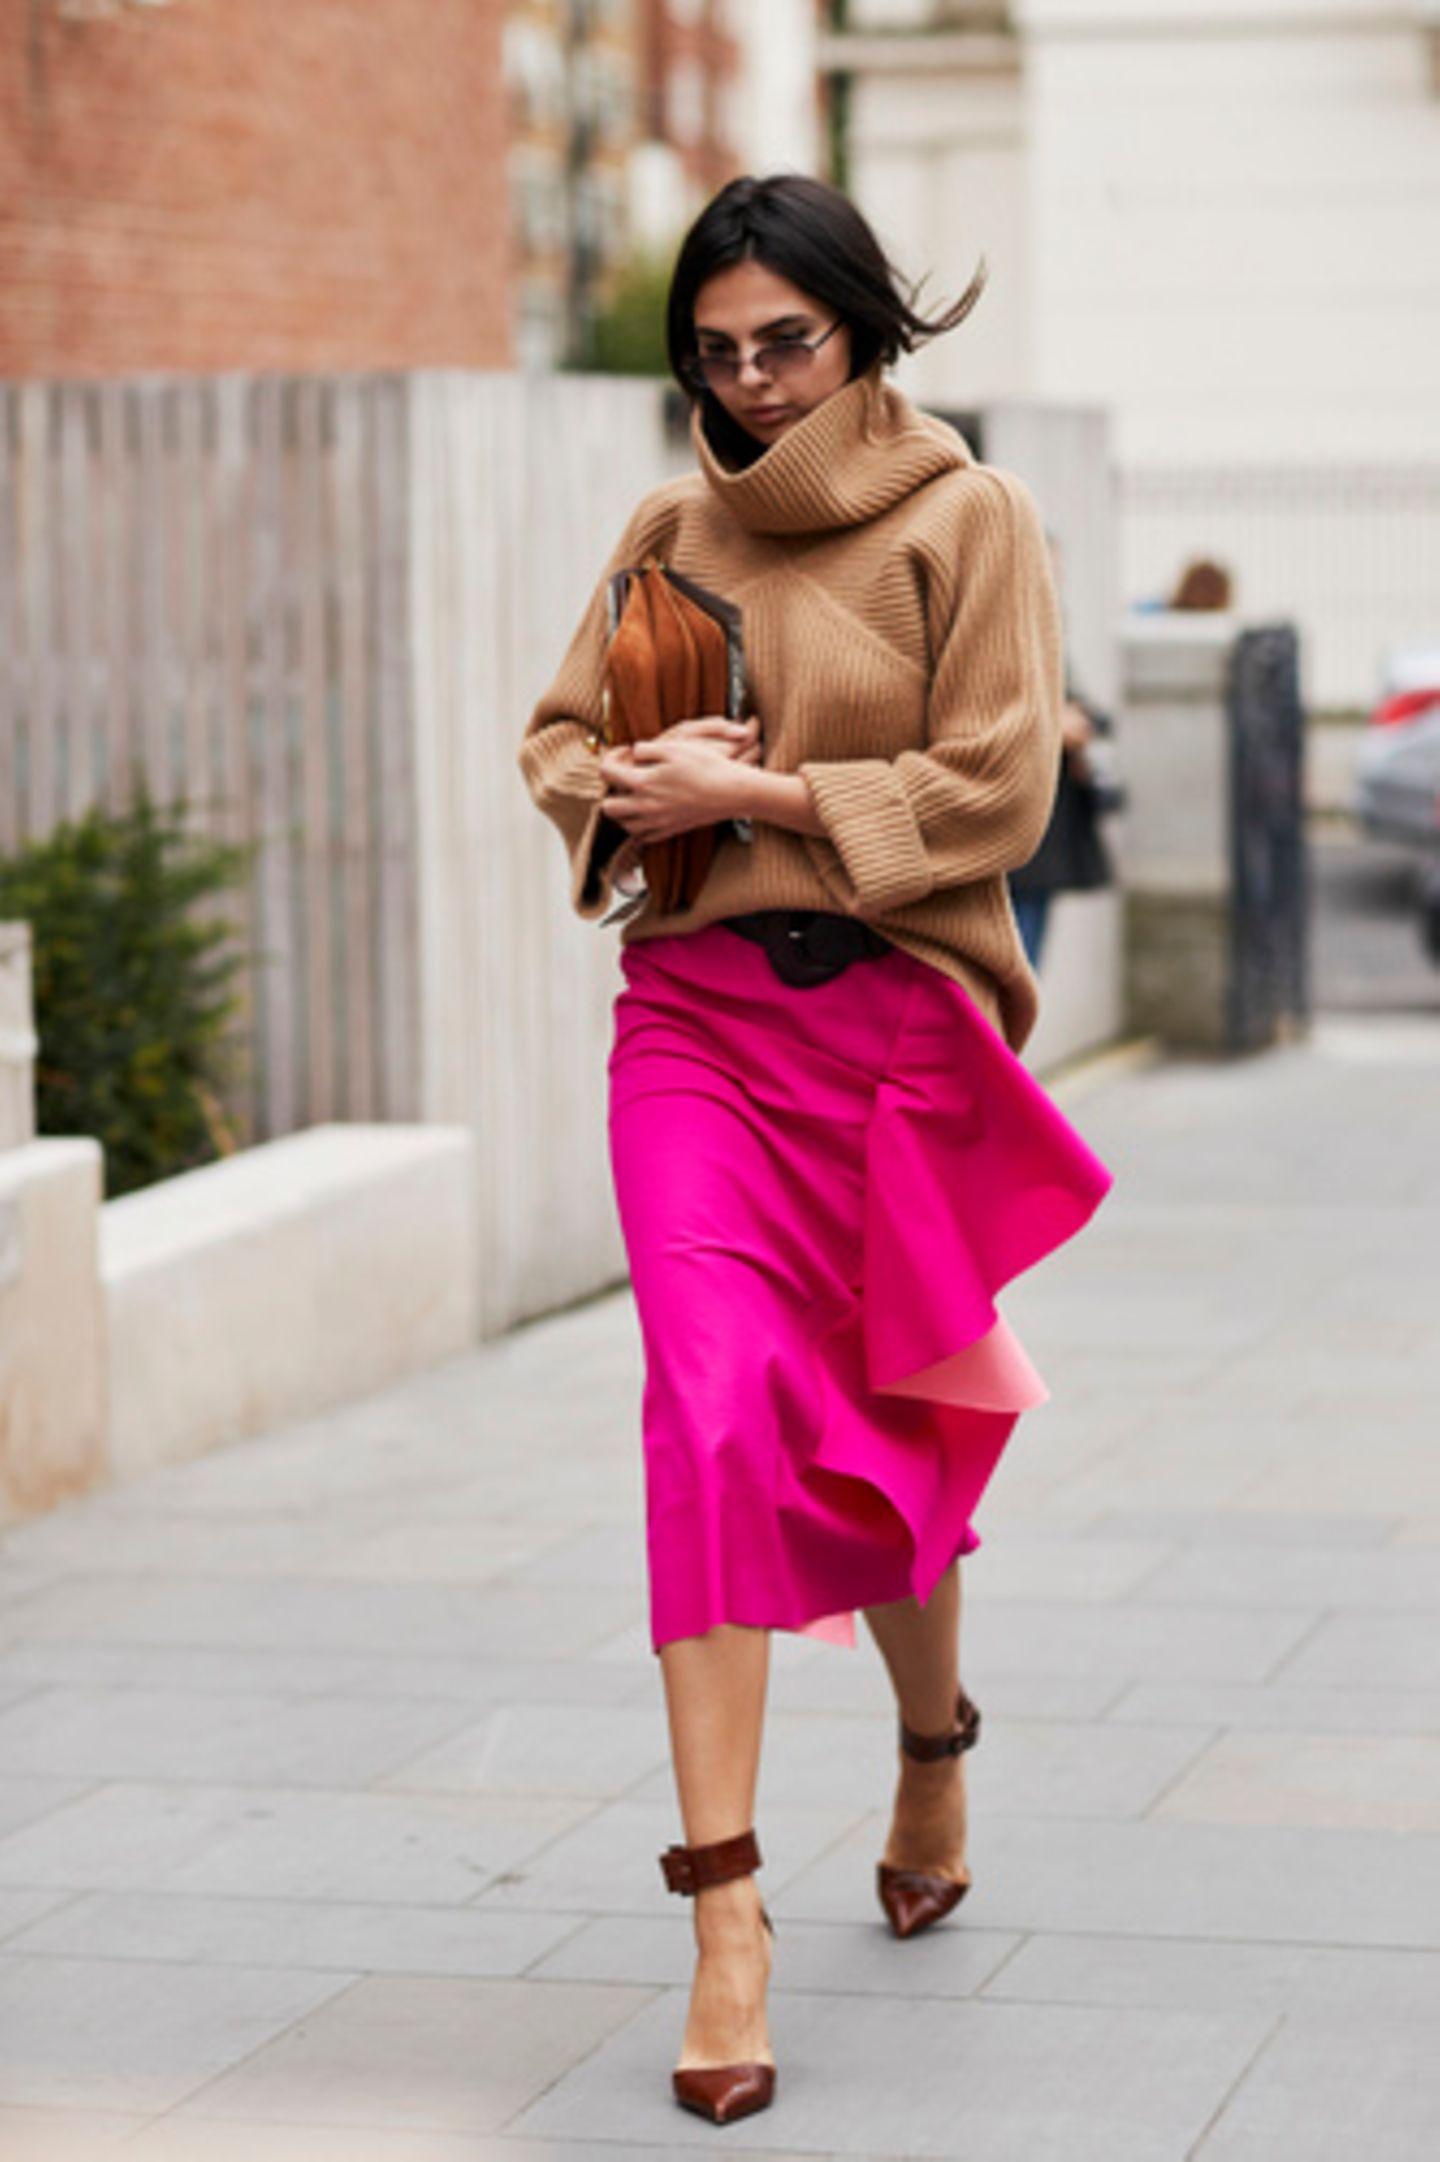 Camelpullover und pinker Seidenrock